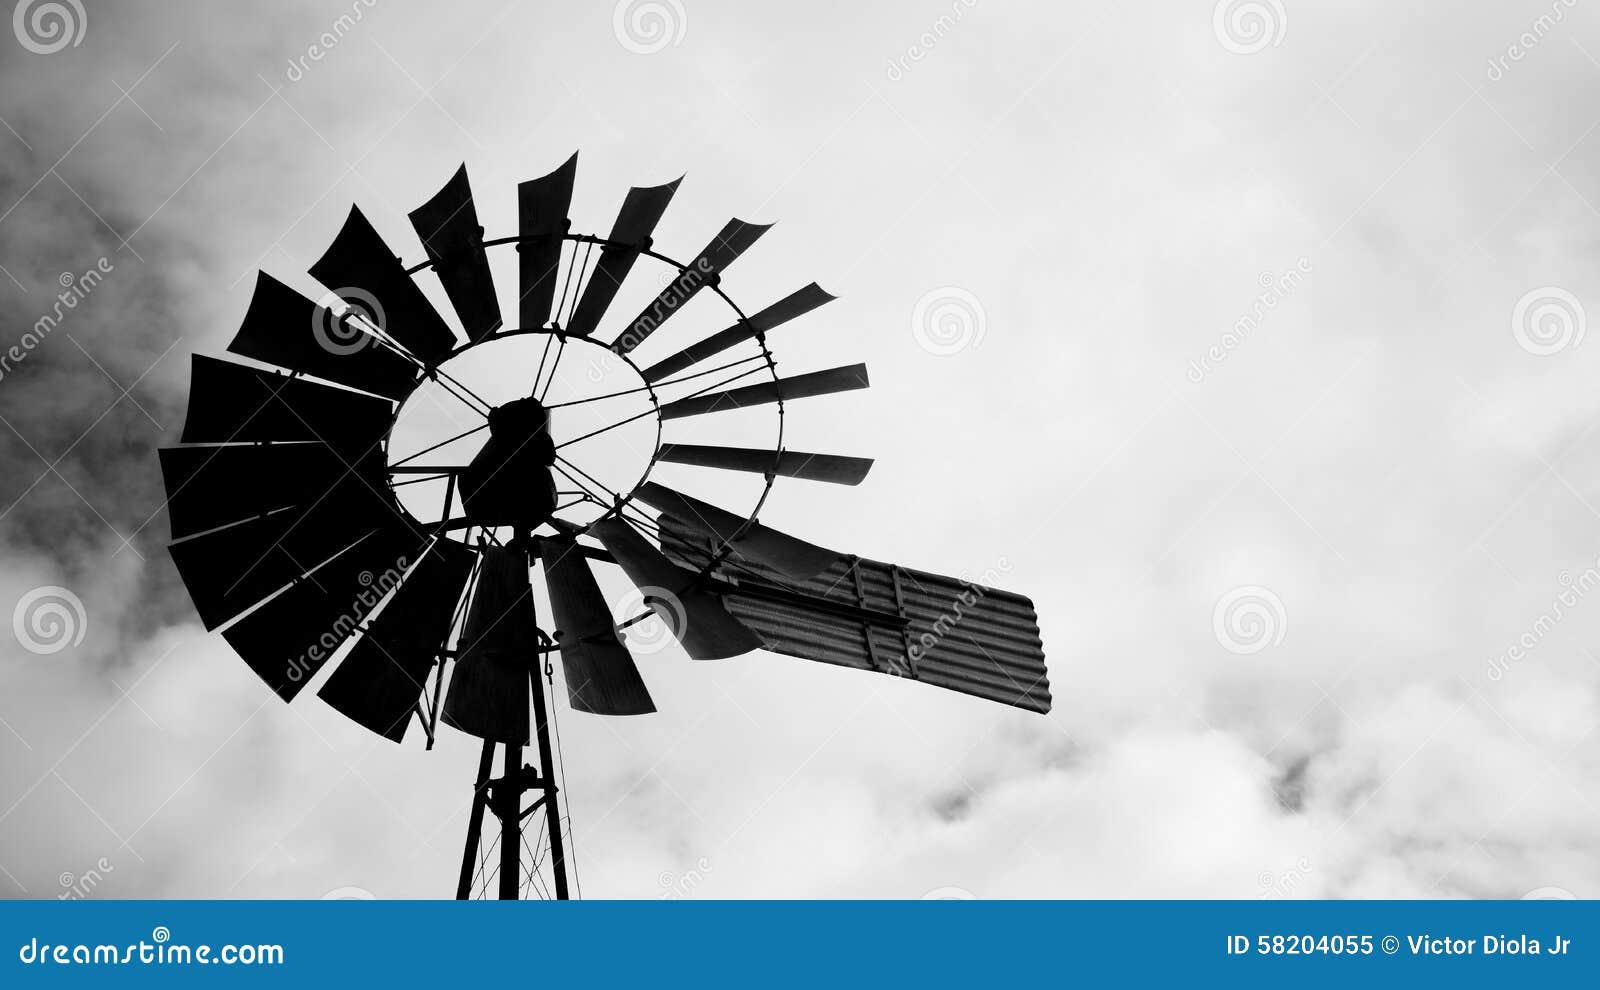 windmill silhouette stock image image of windmill vain 58204055